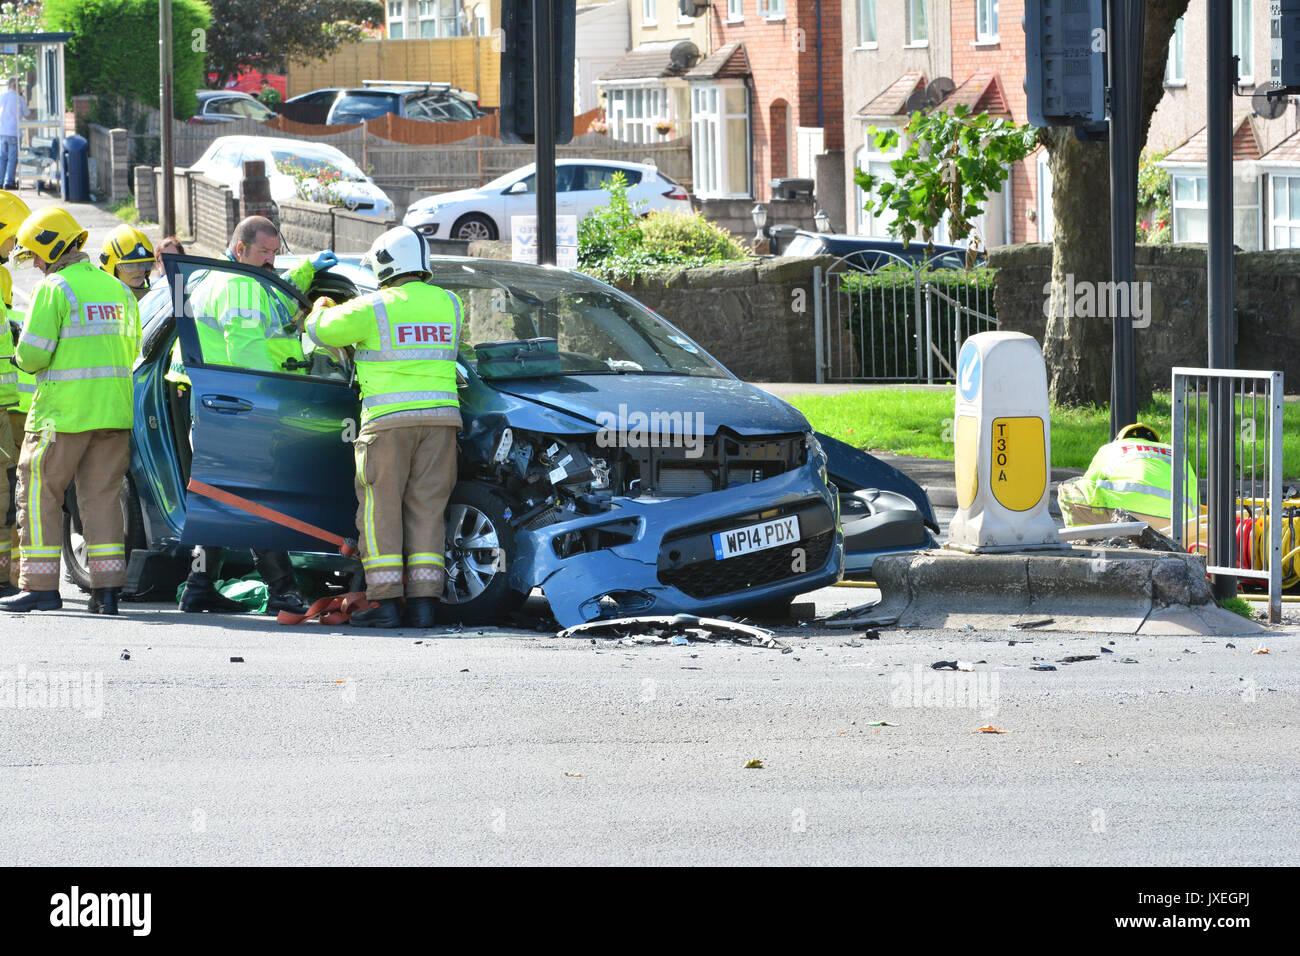 bristol, uk. 16th august, 2017. 2 car crash closes a37 airport road